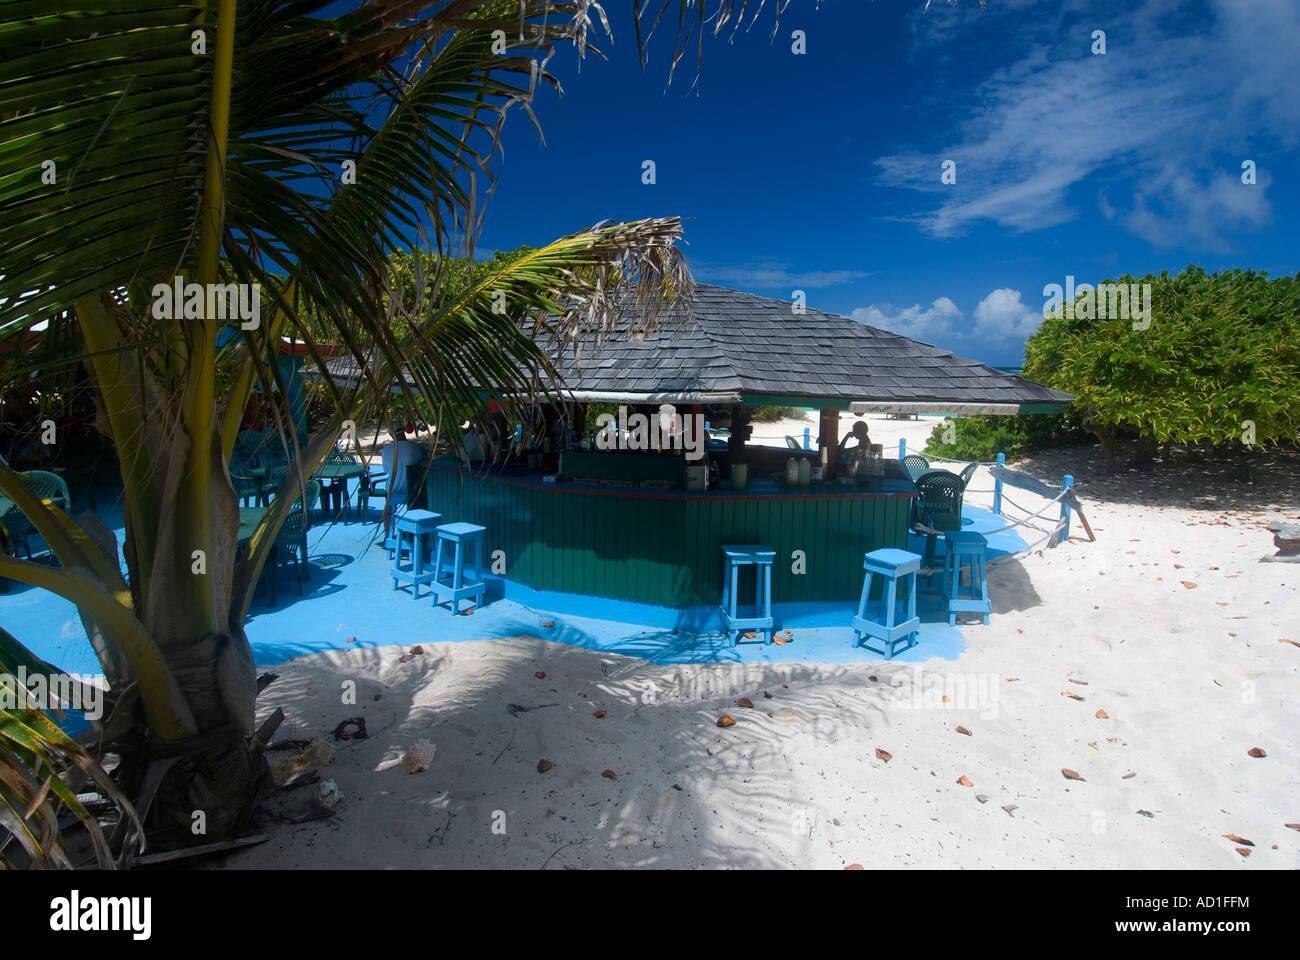 Anegada British Virgin Islands Images